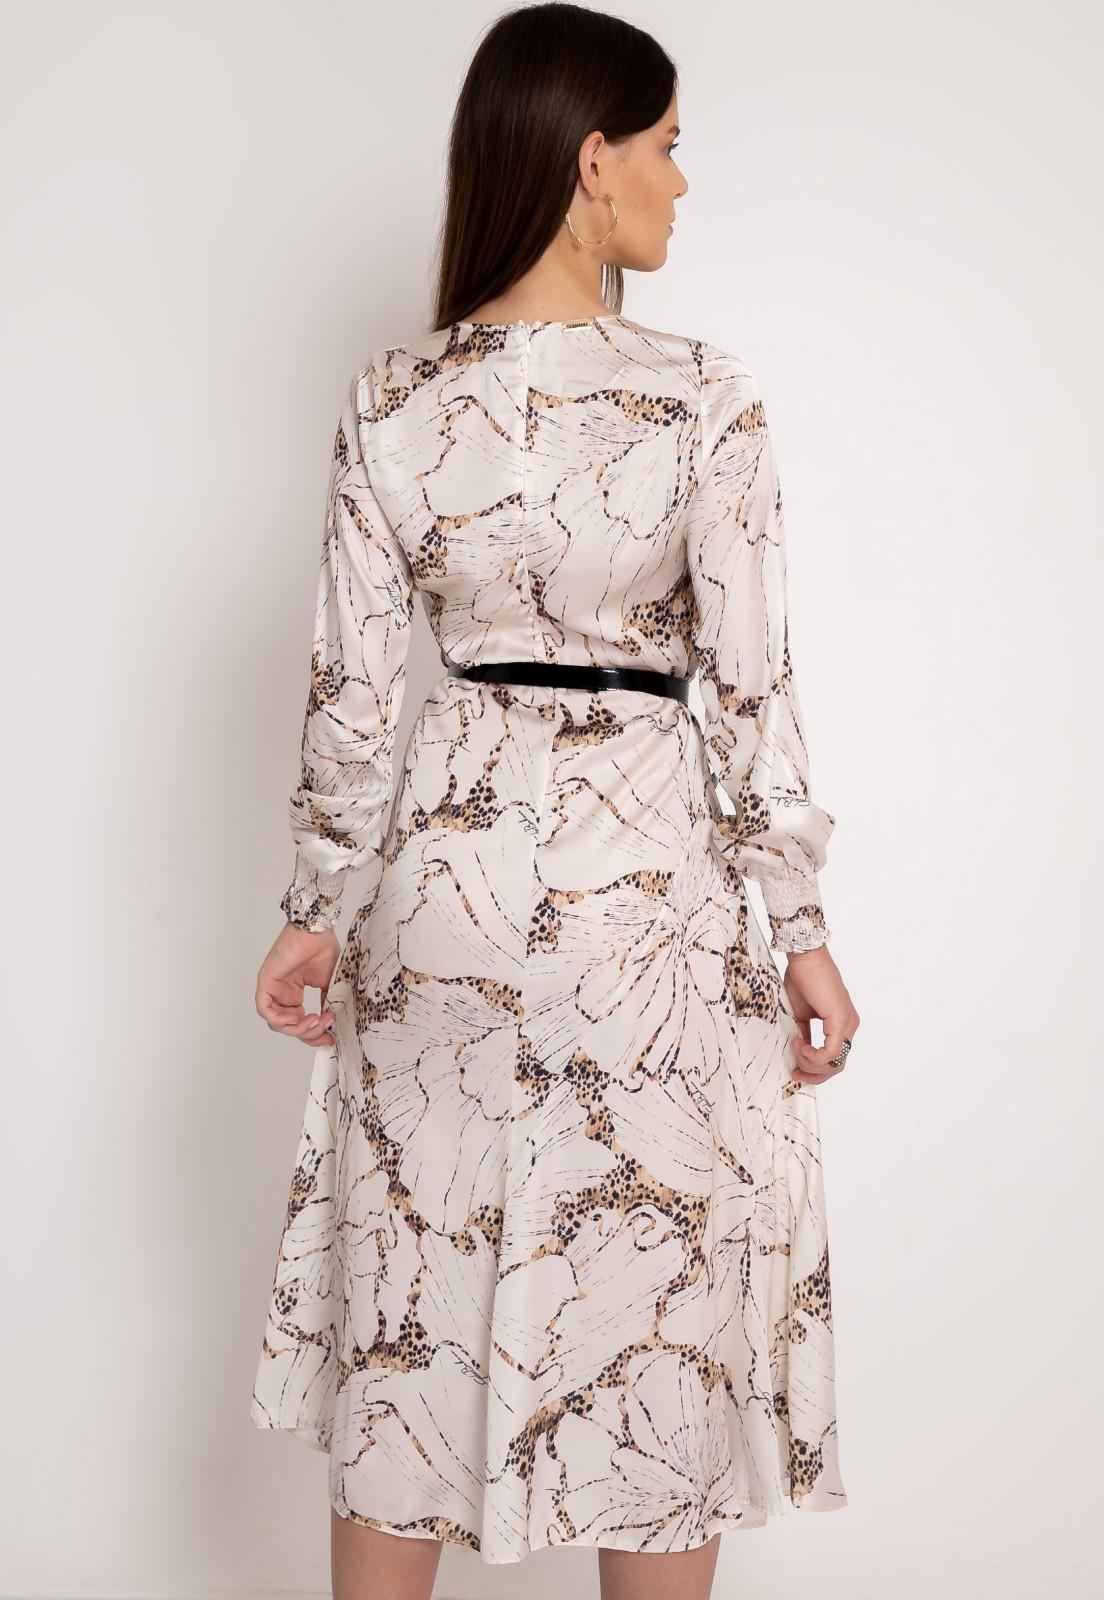 Vestido midi estampa animal print